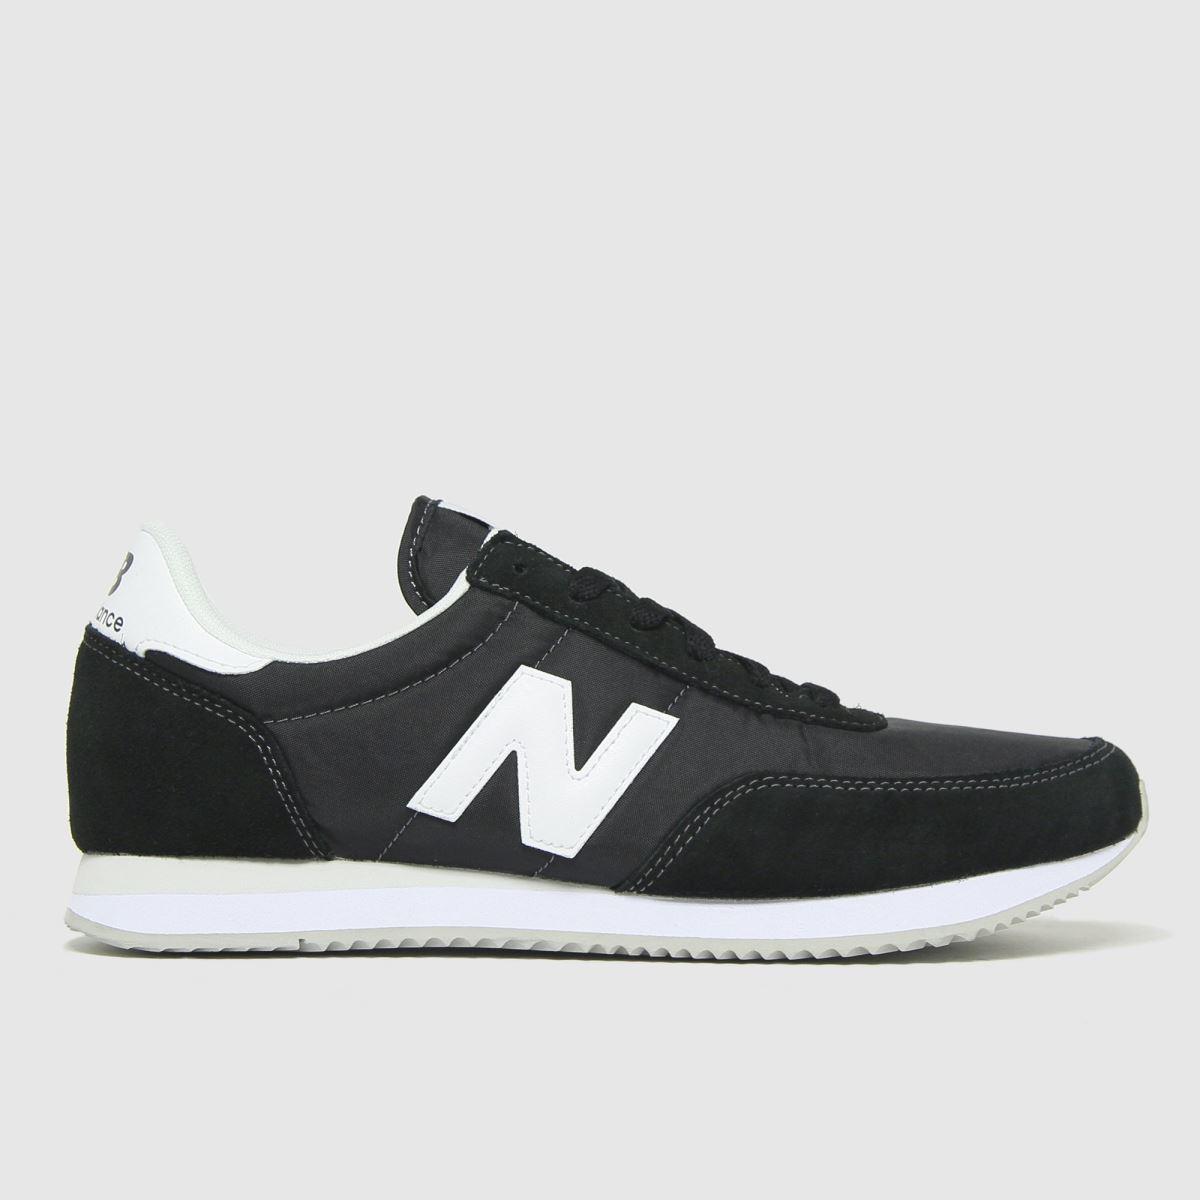 New Balance Black 720 Trainers